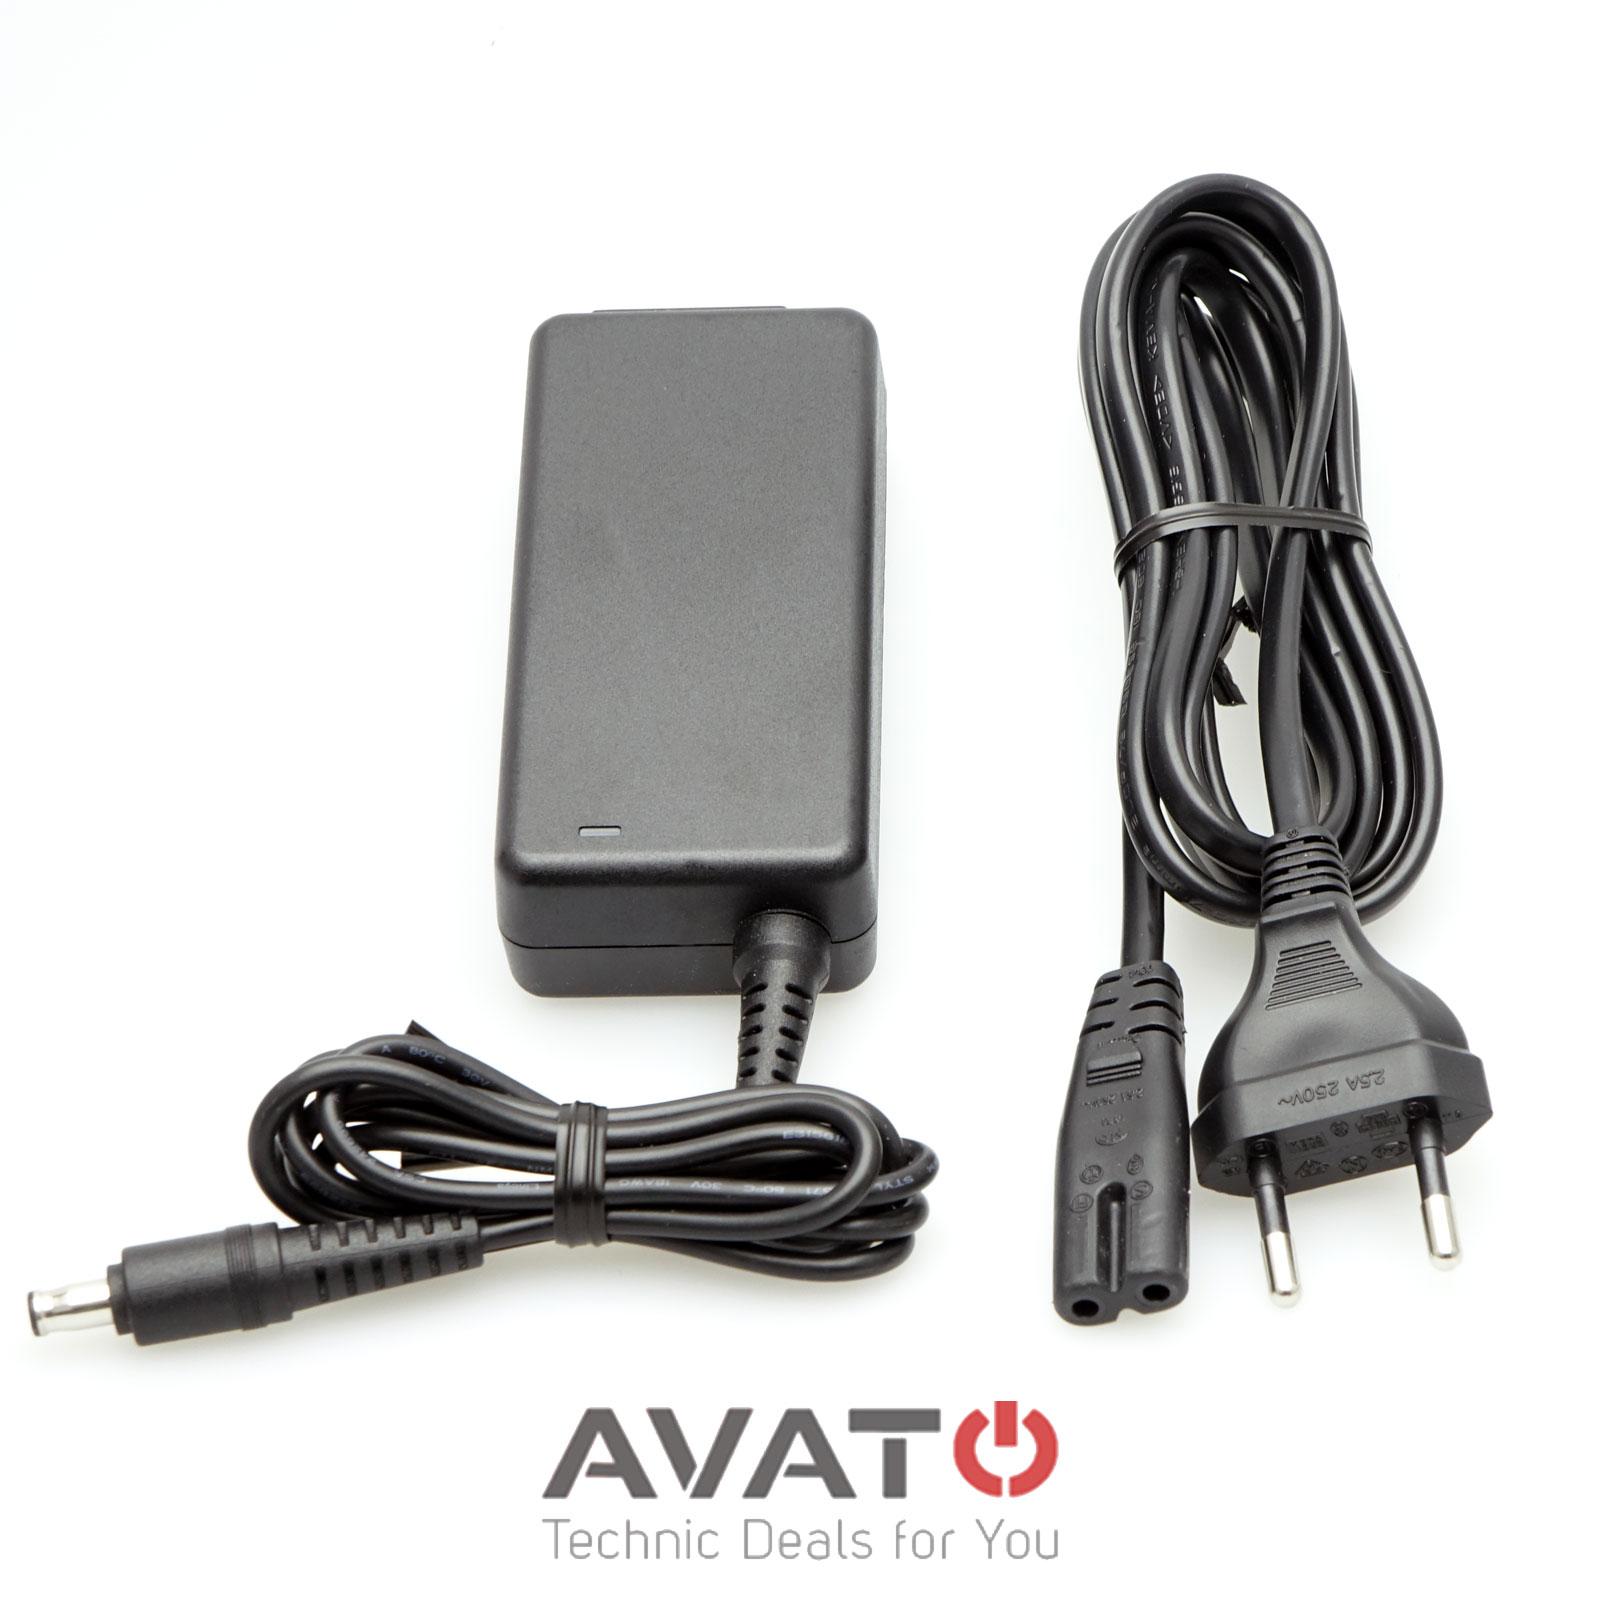 Netzteil Adapter 12V 3.33A Ersatz für Receiver SKY Humax iCord mini